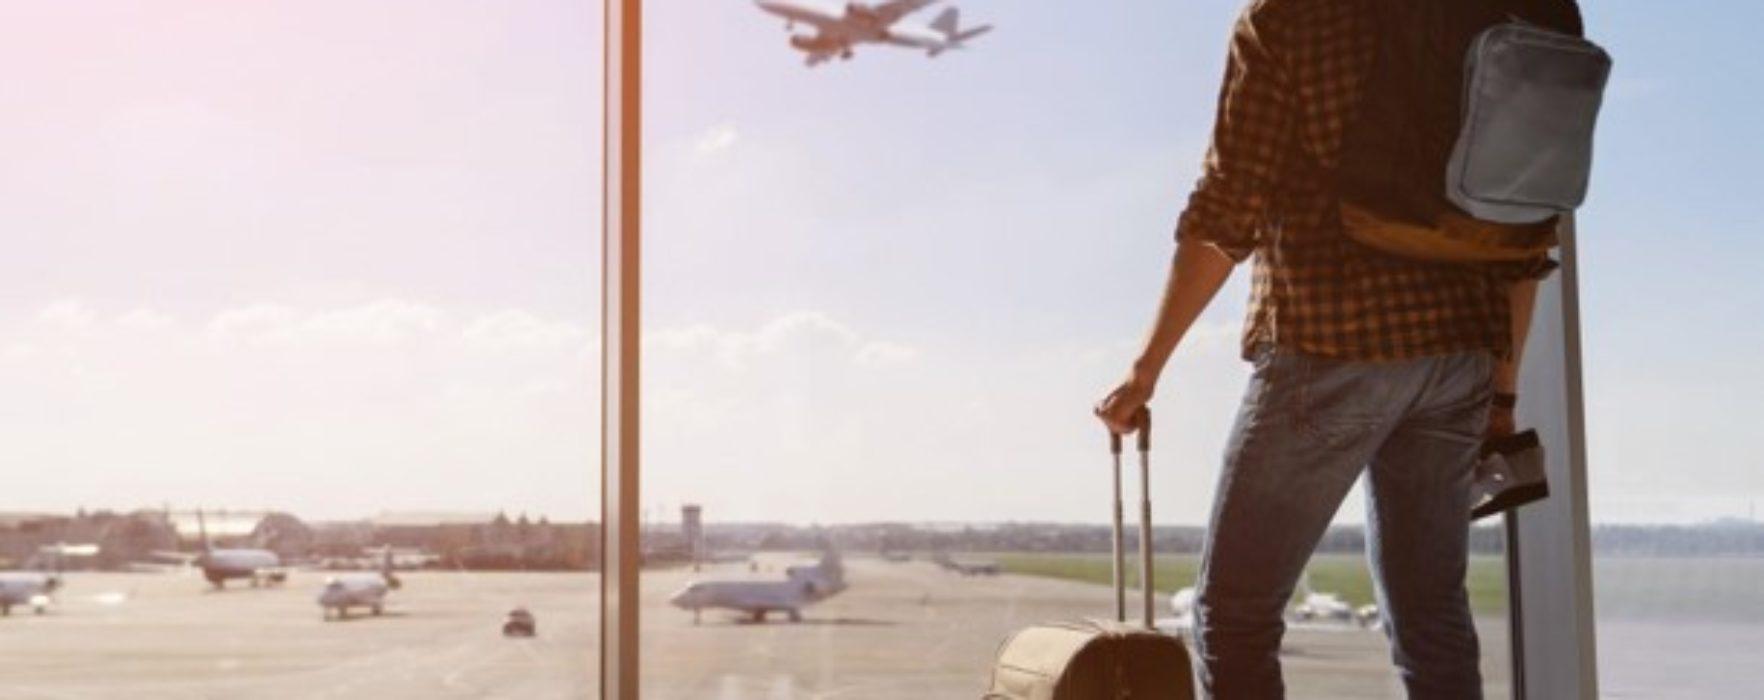 The value of the British passport: UK travel document slips further down in international rankings